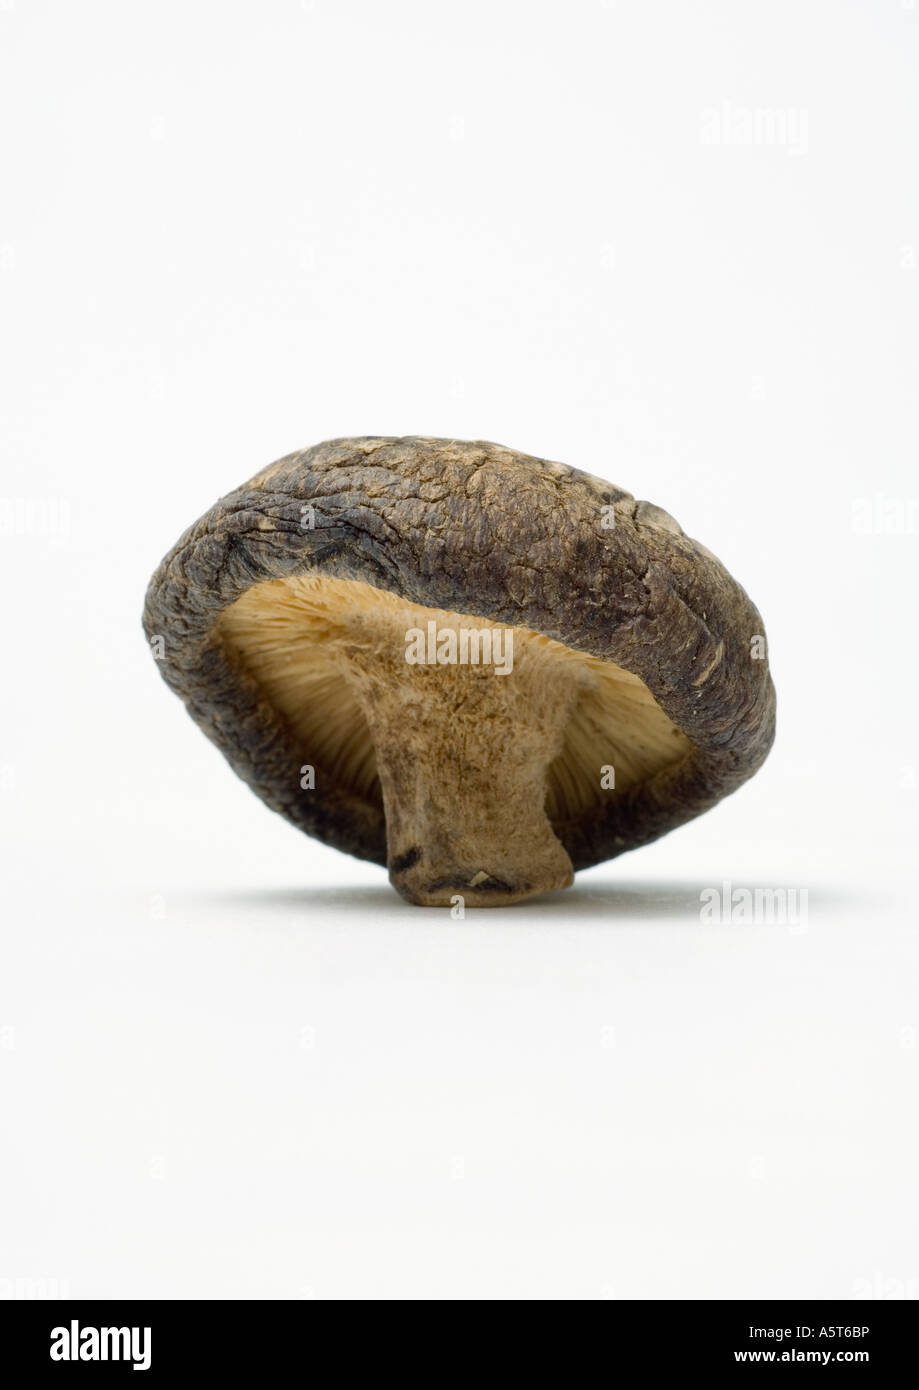 Shiitake mushroom - Stock Image